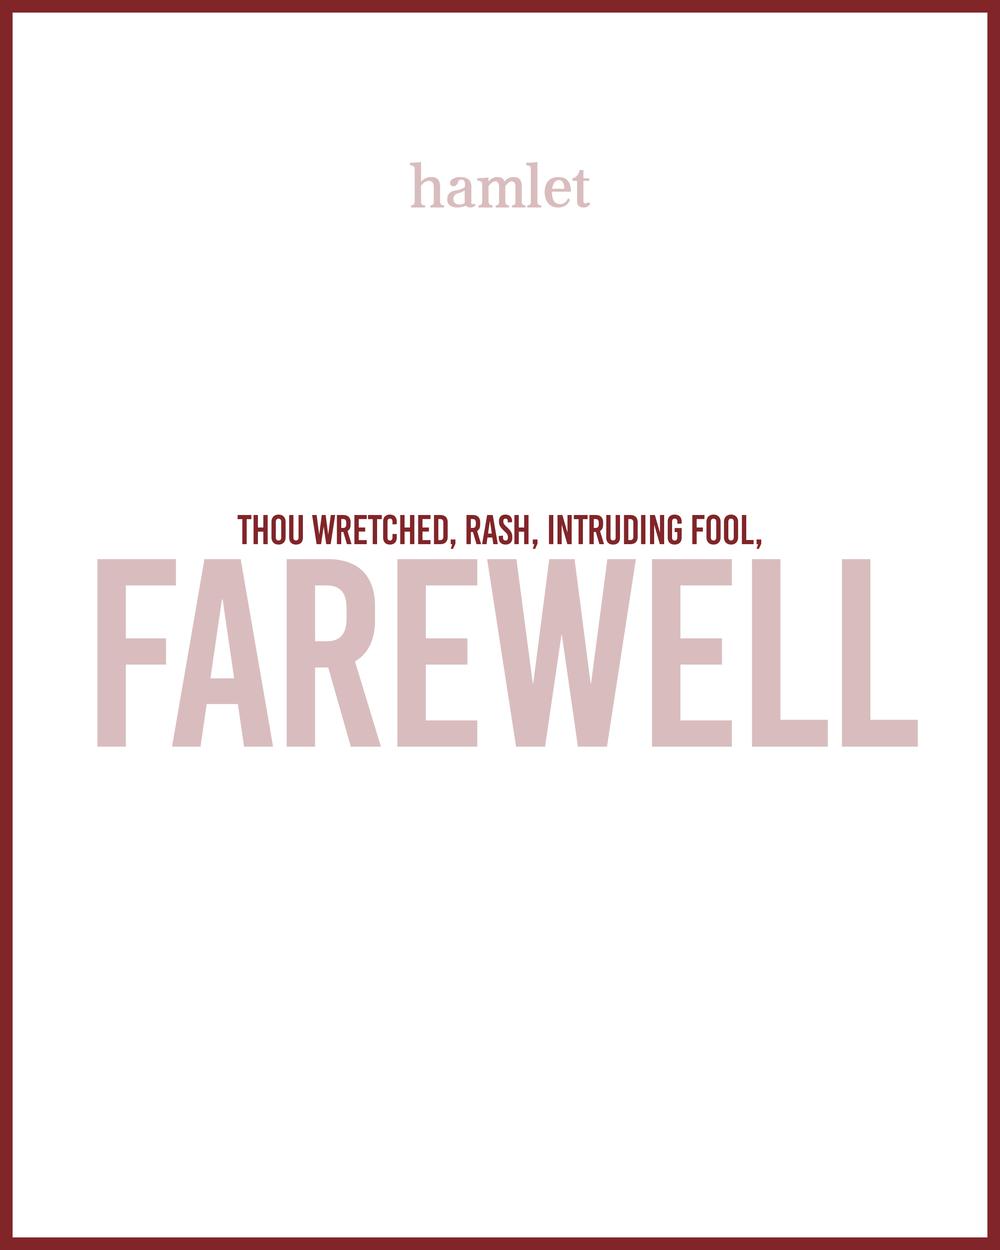 Hamlet Posters ACT III-12.png